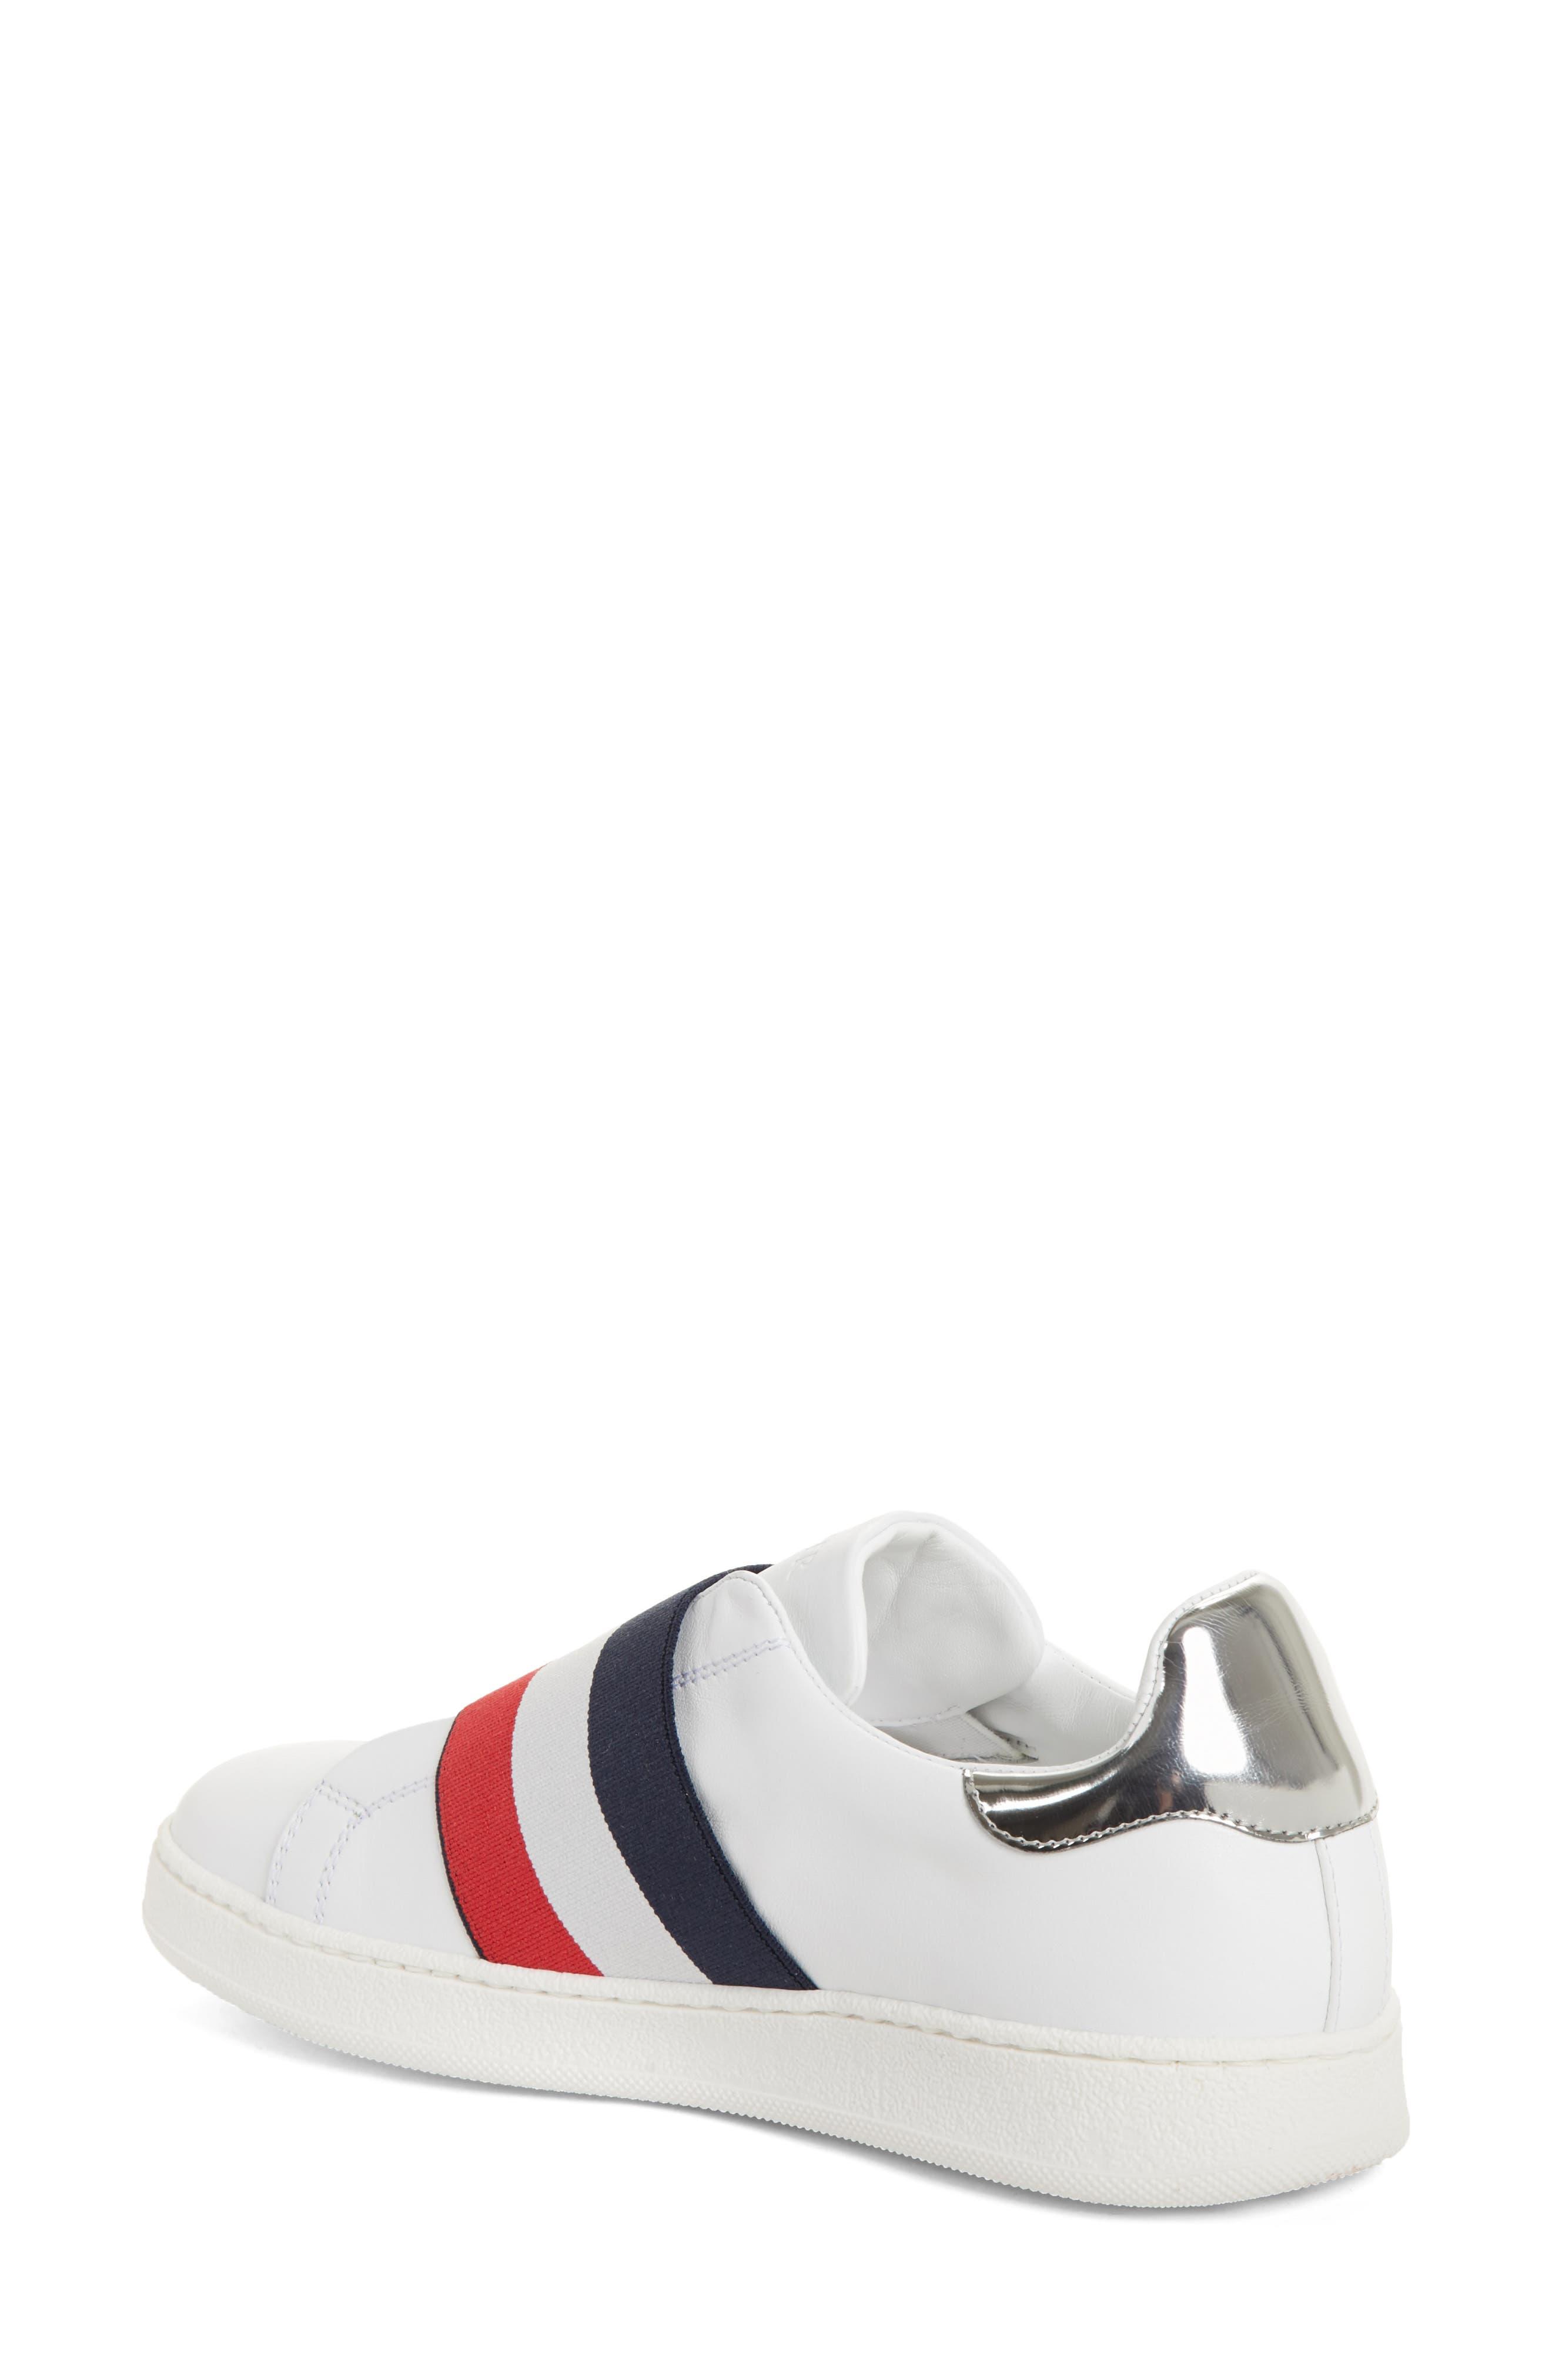 Alizee Low Top Sneaker,                             Alternate thumbnail 2, color,                             White